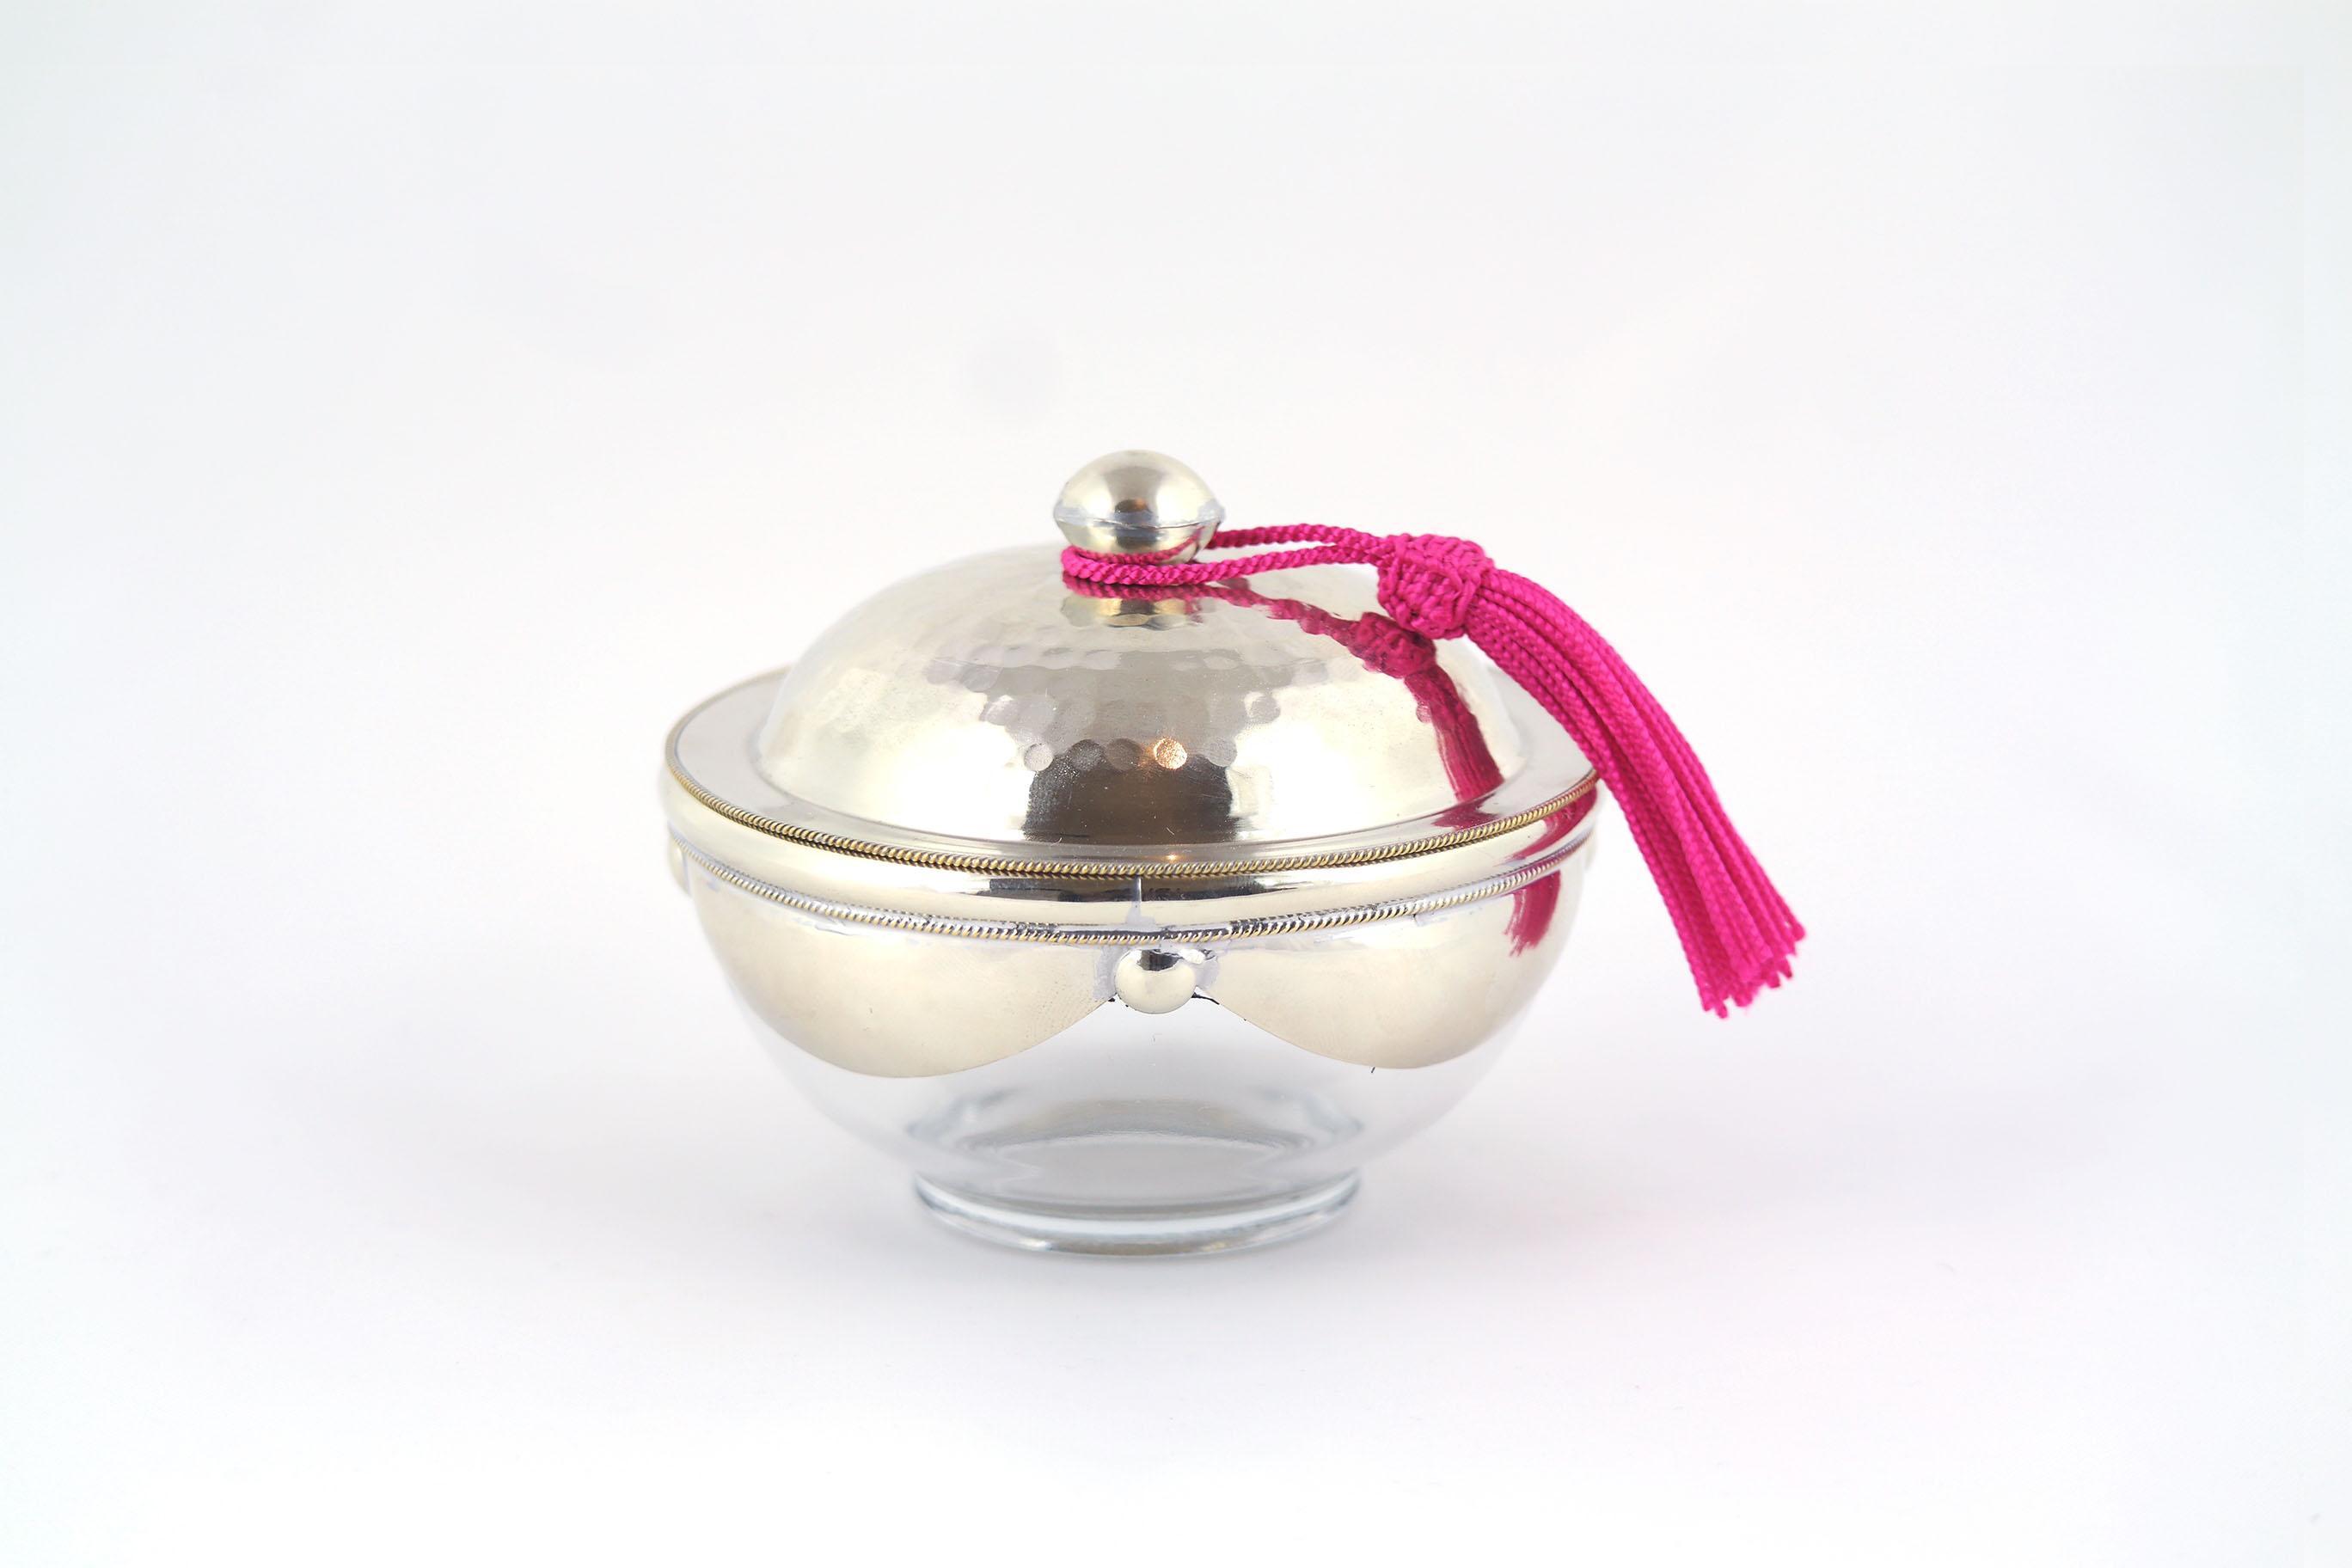 yasaboun pot en verre couvercle m tallique sabrayal. Black Bedroom Furniture Sets. Home Design Ideas